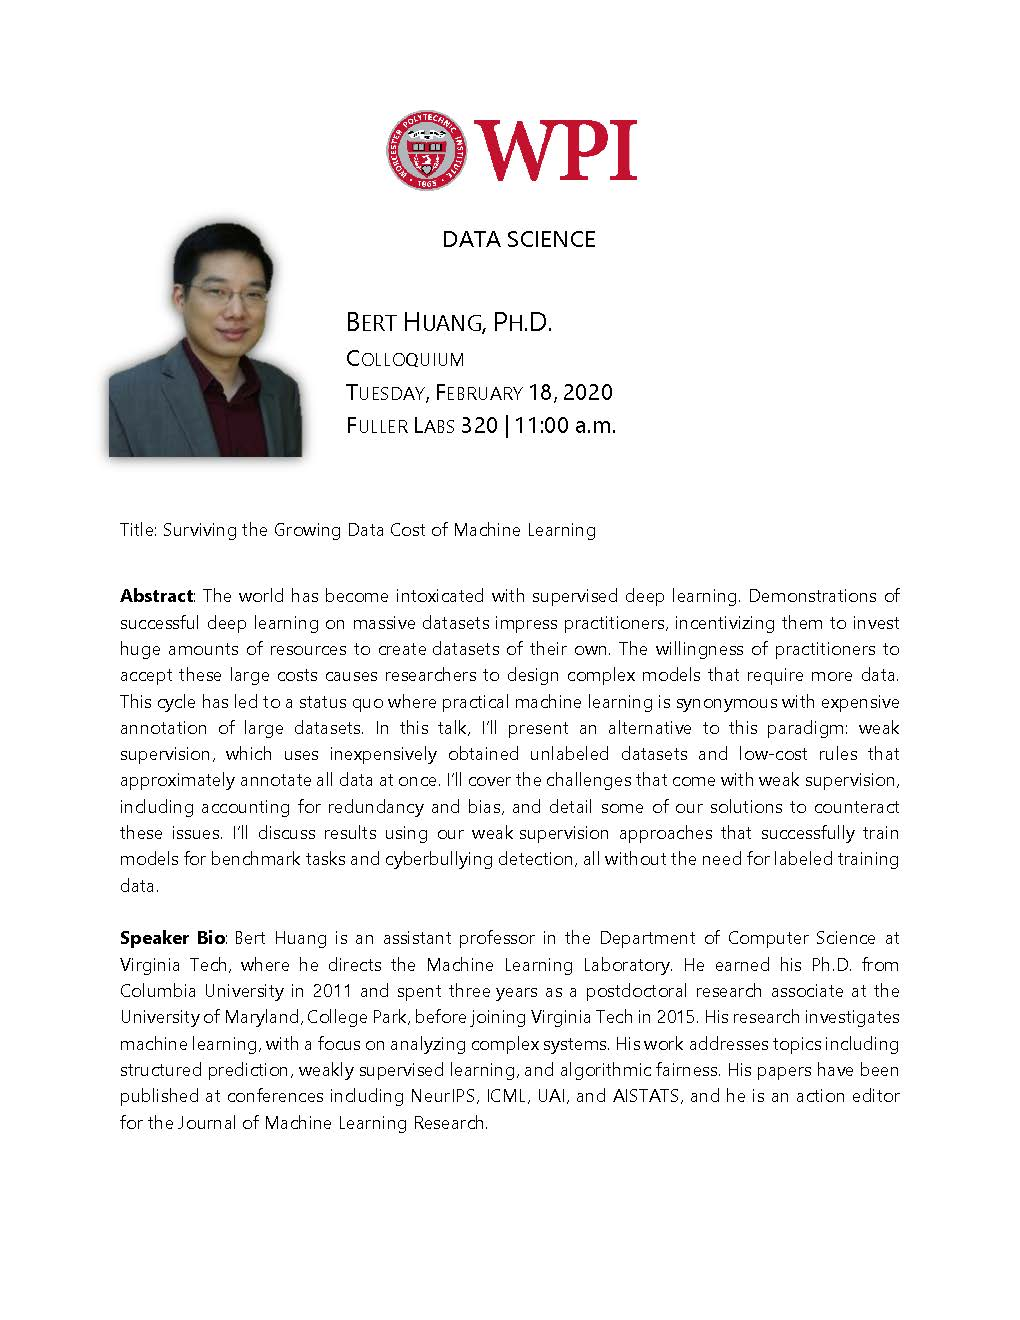 Bert Huang, Ph.D. Colloquium alt